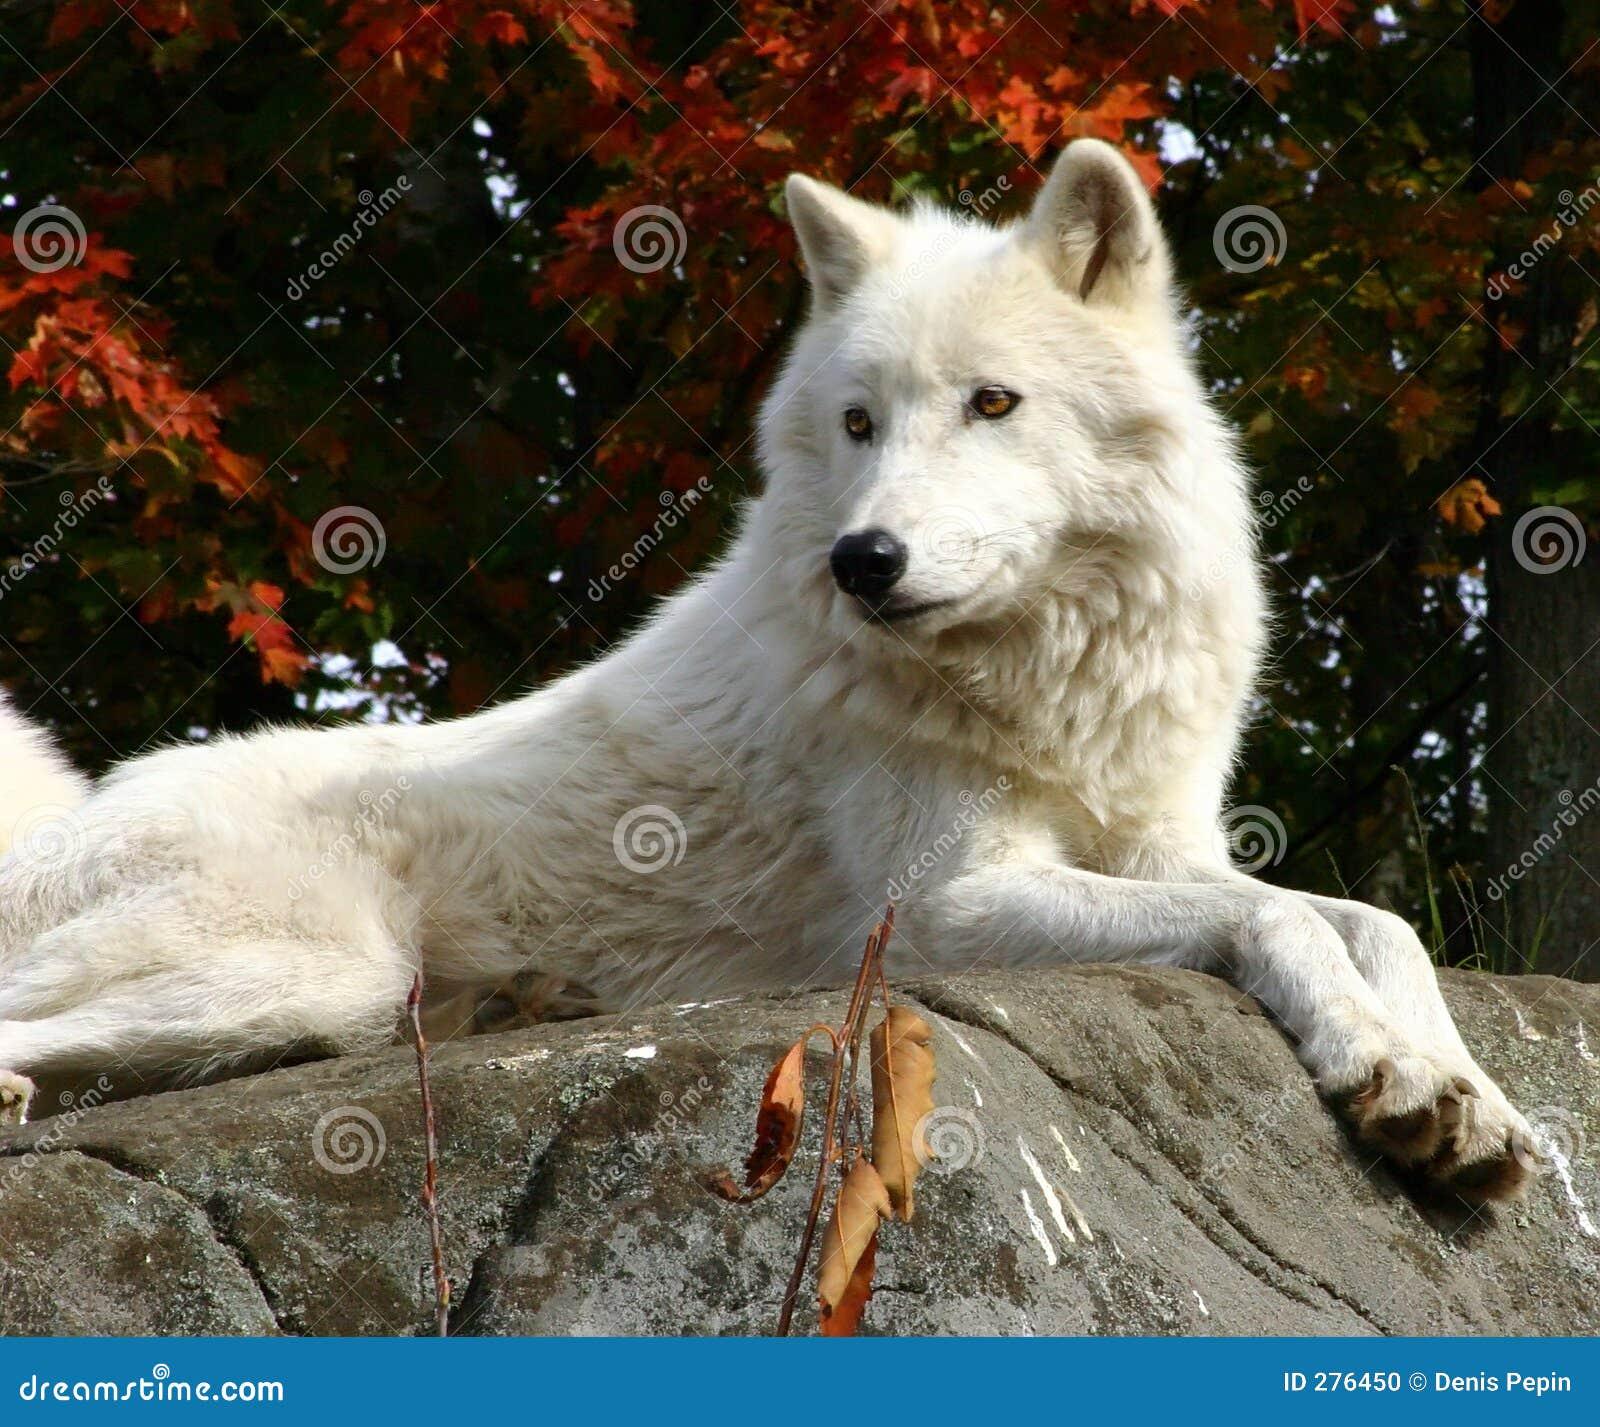 noordpool wolf die op een rots legt stock foto afbeelding 276450. Black Bedroom Furniture Sets. Home Design Ideas